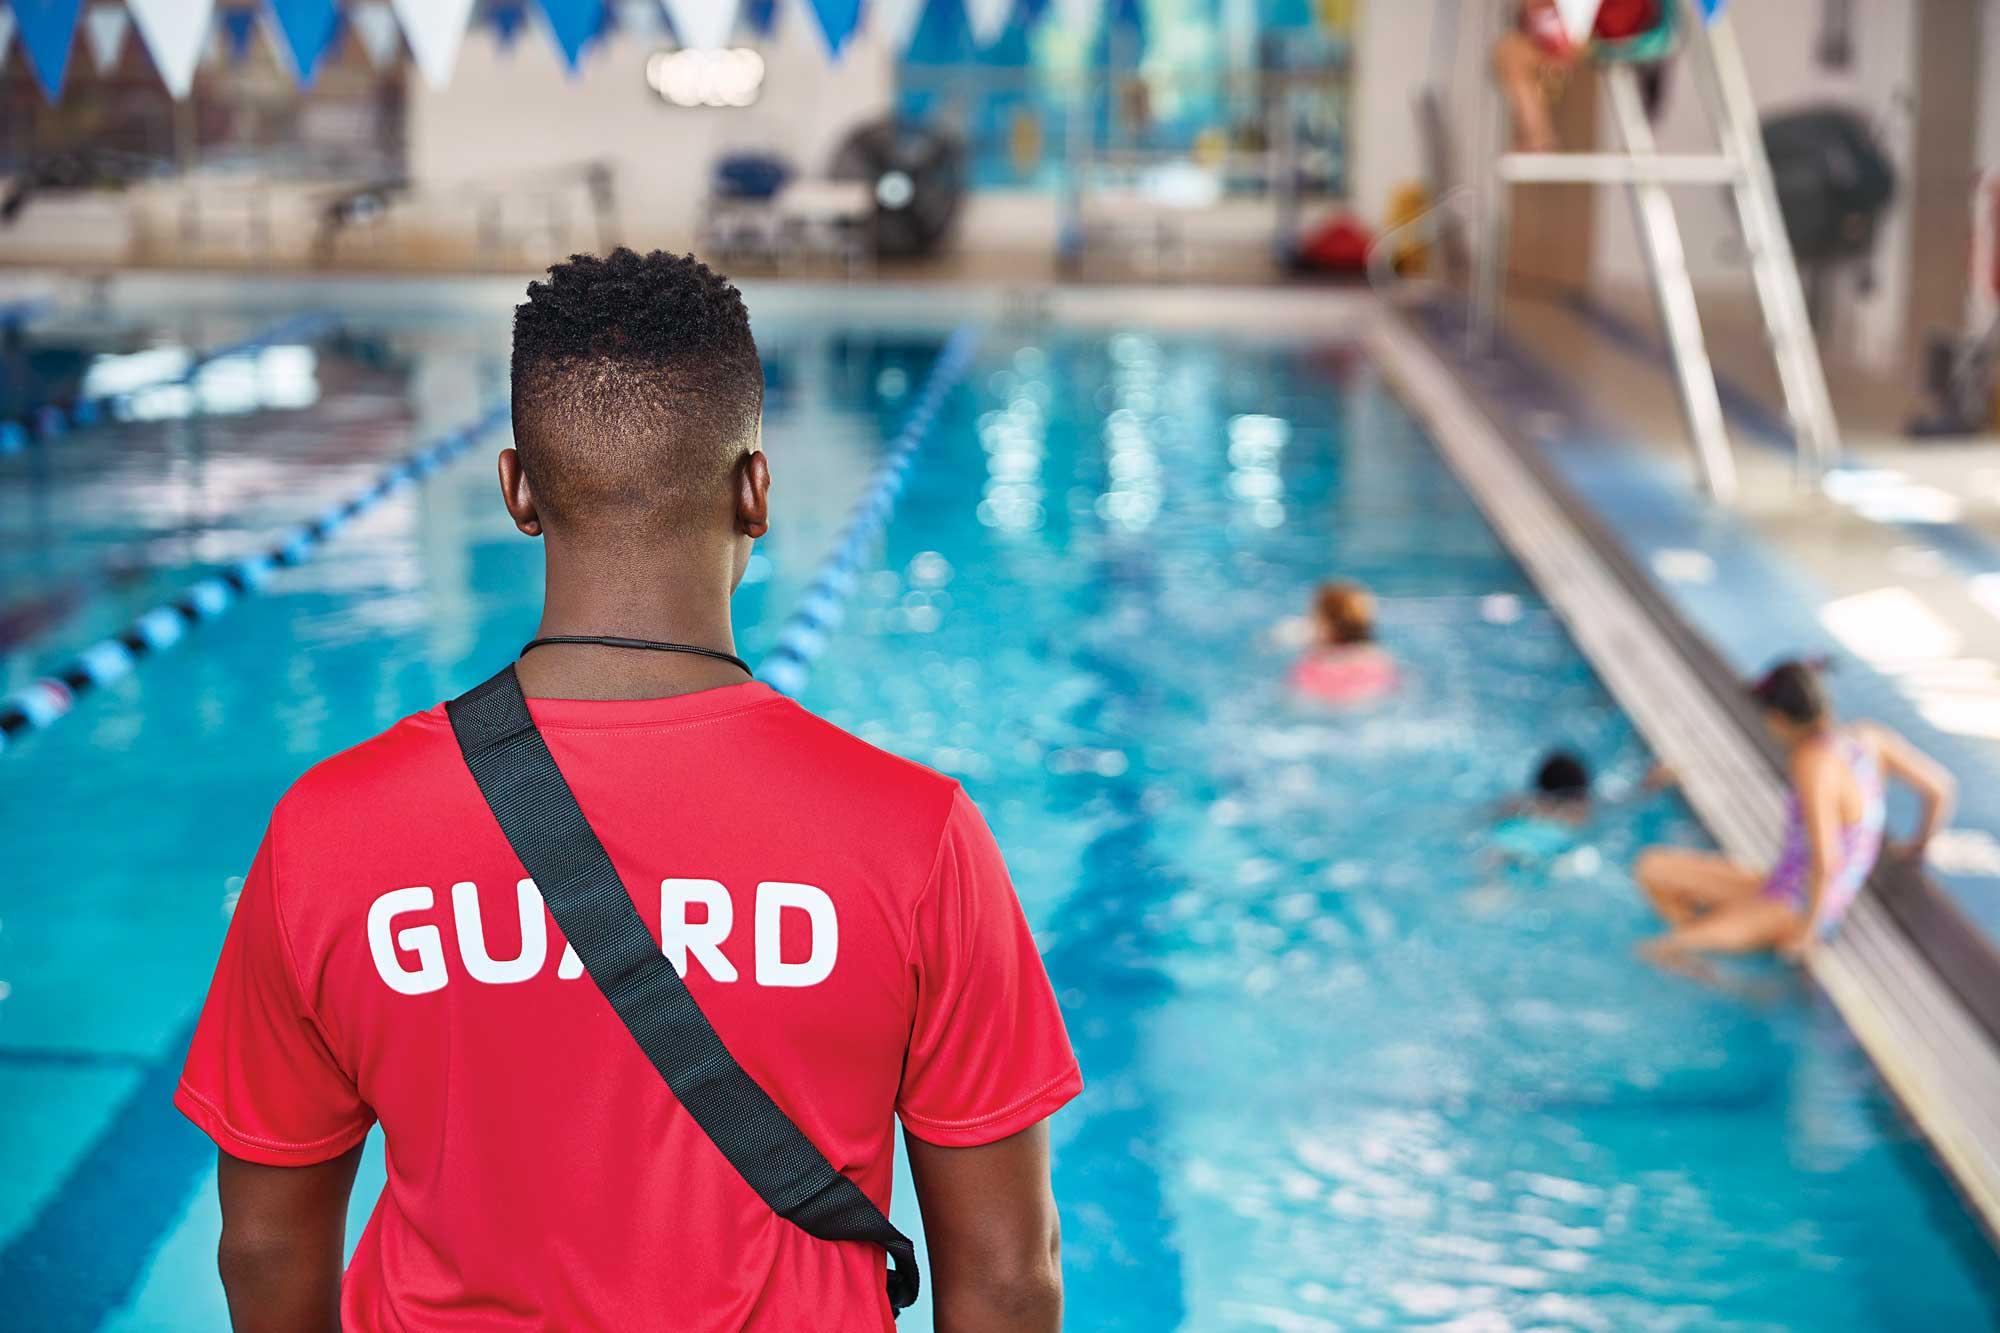 Lifeguard, Back